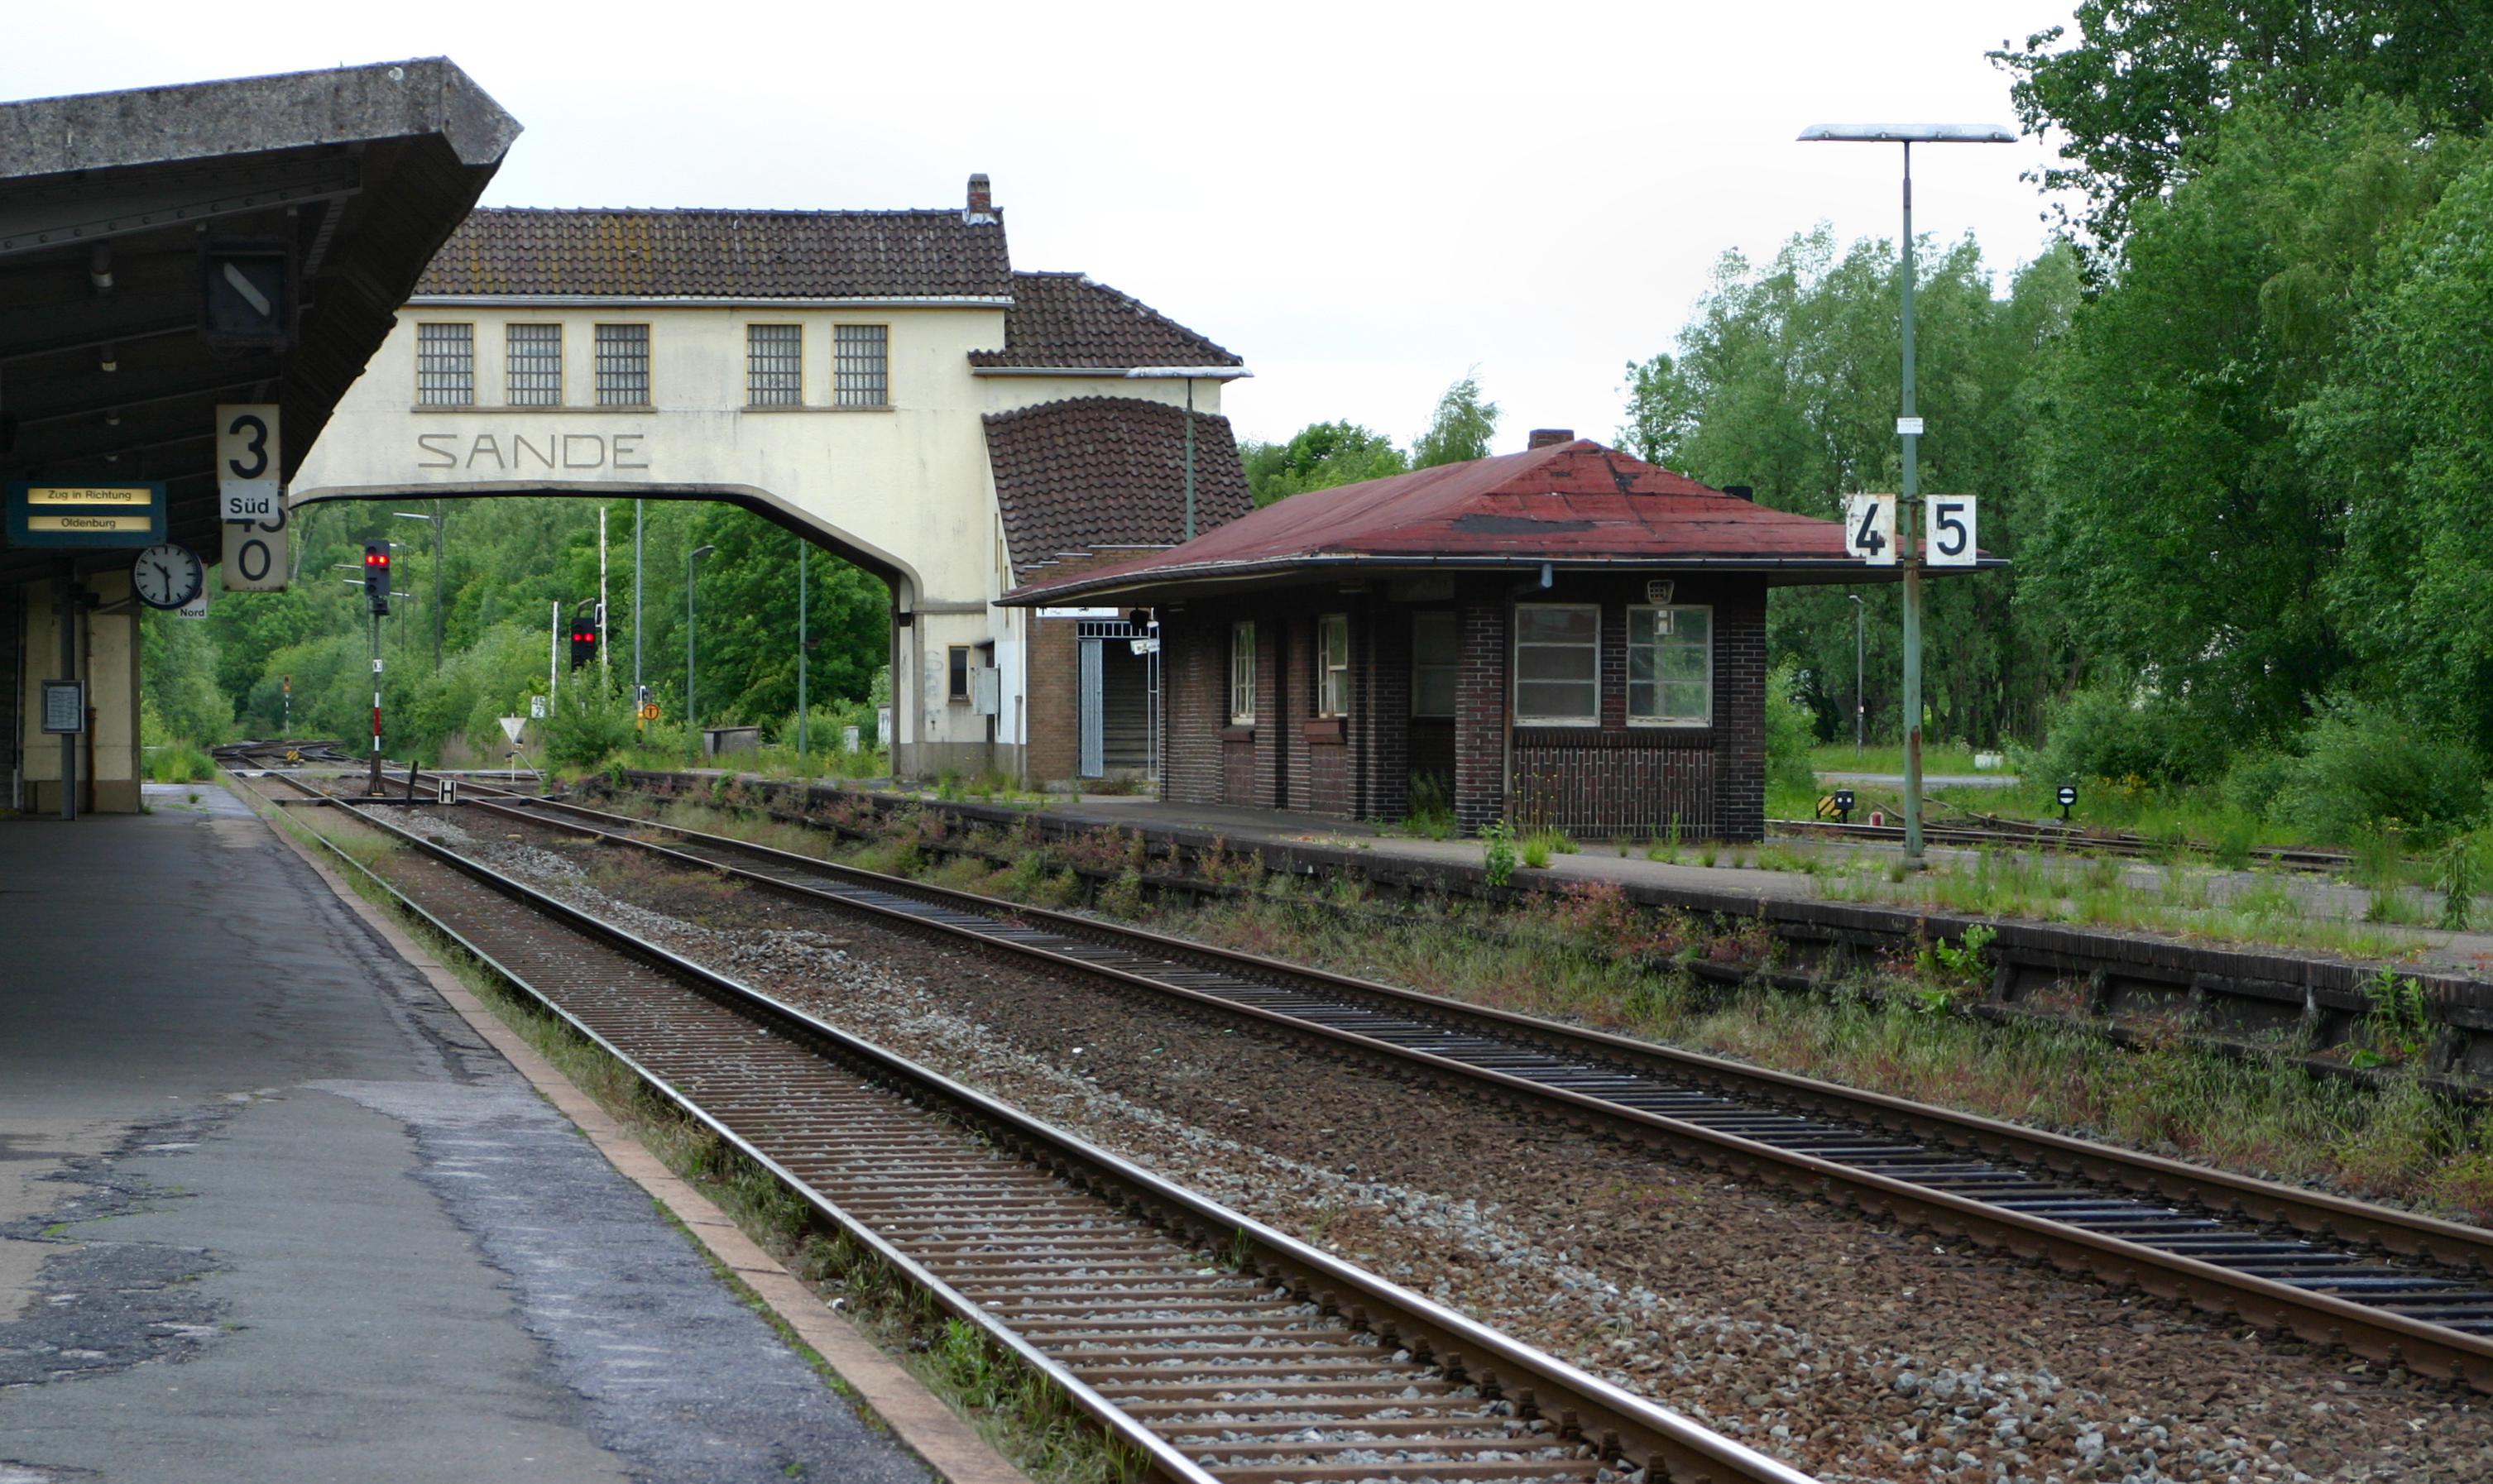 Bahnhof Bilder